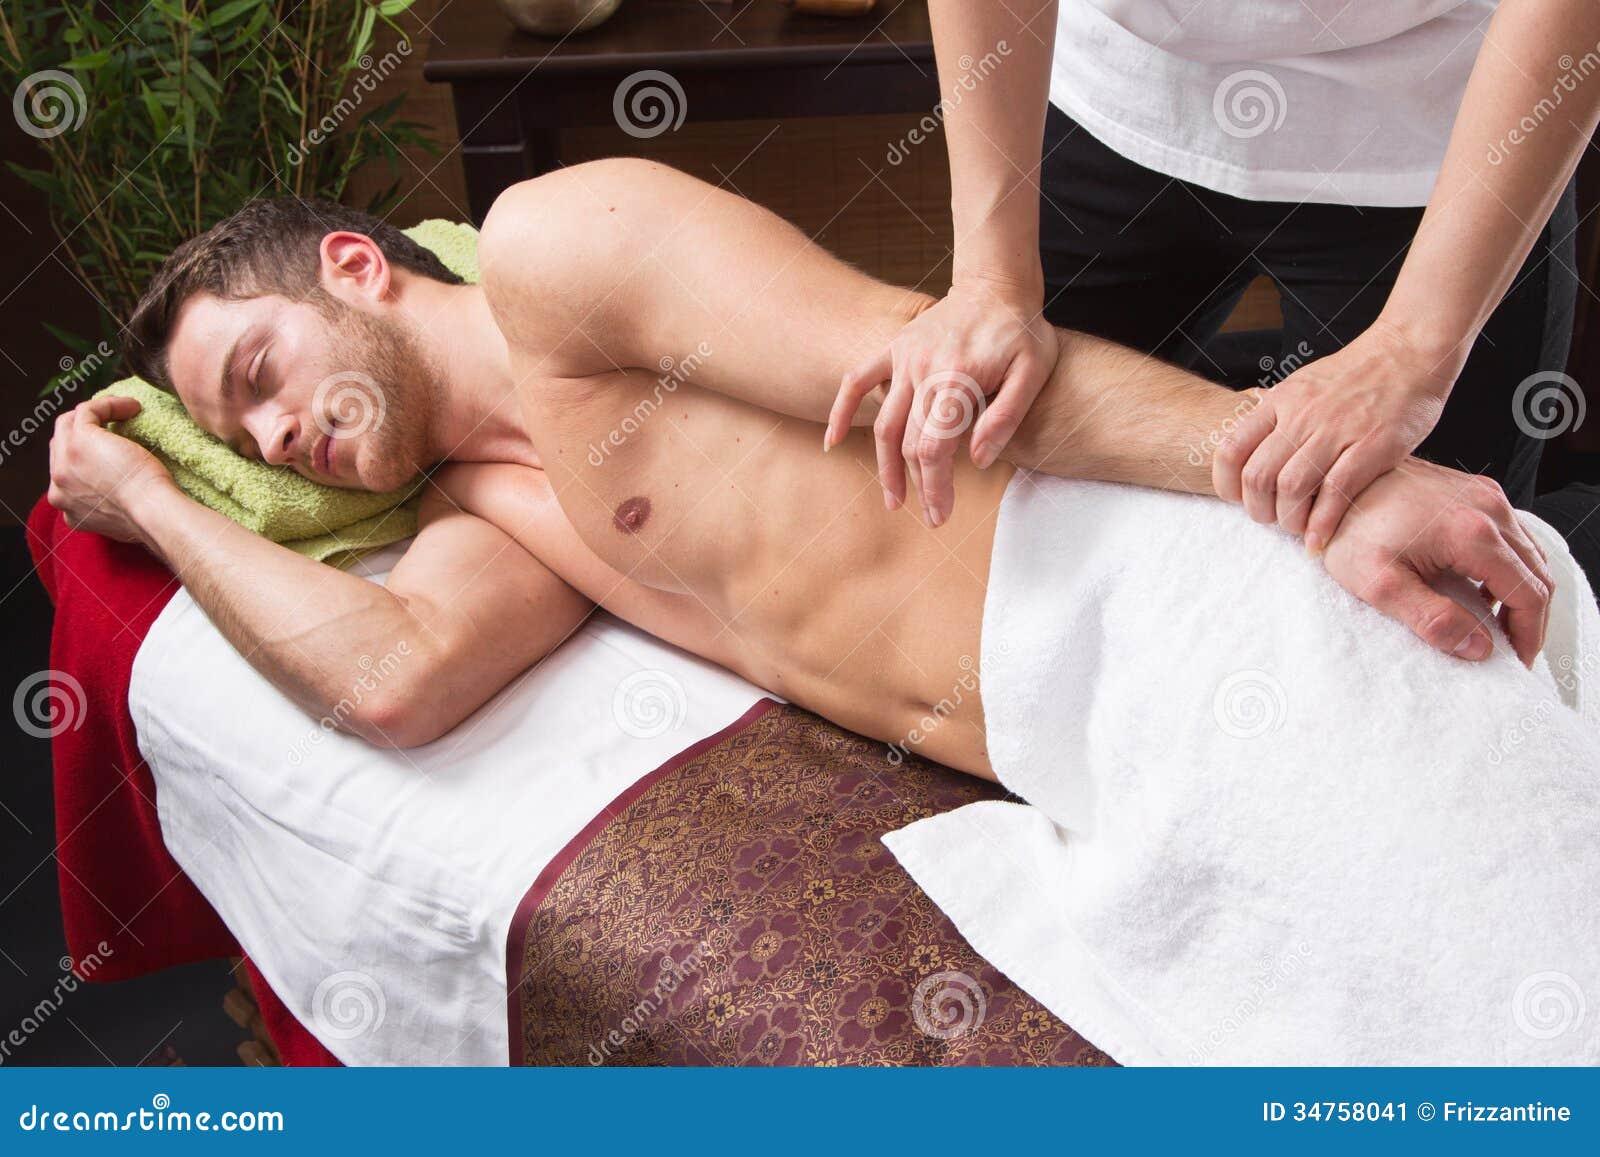 male massage for females Busselton